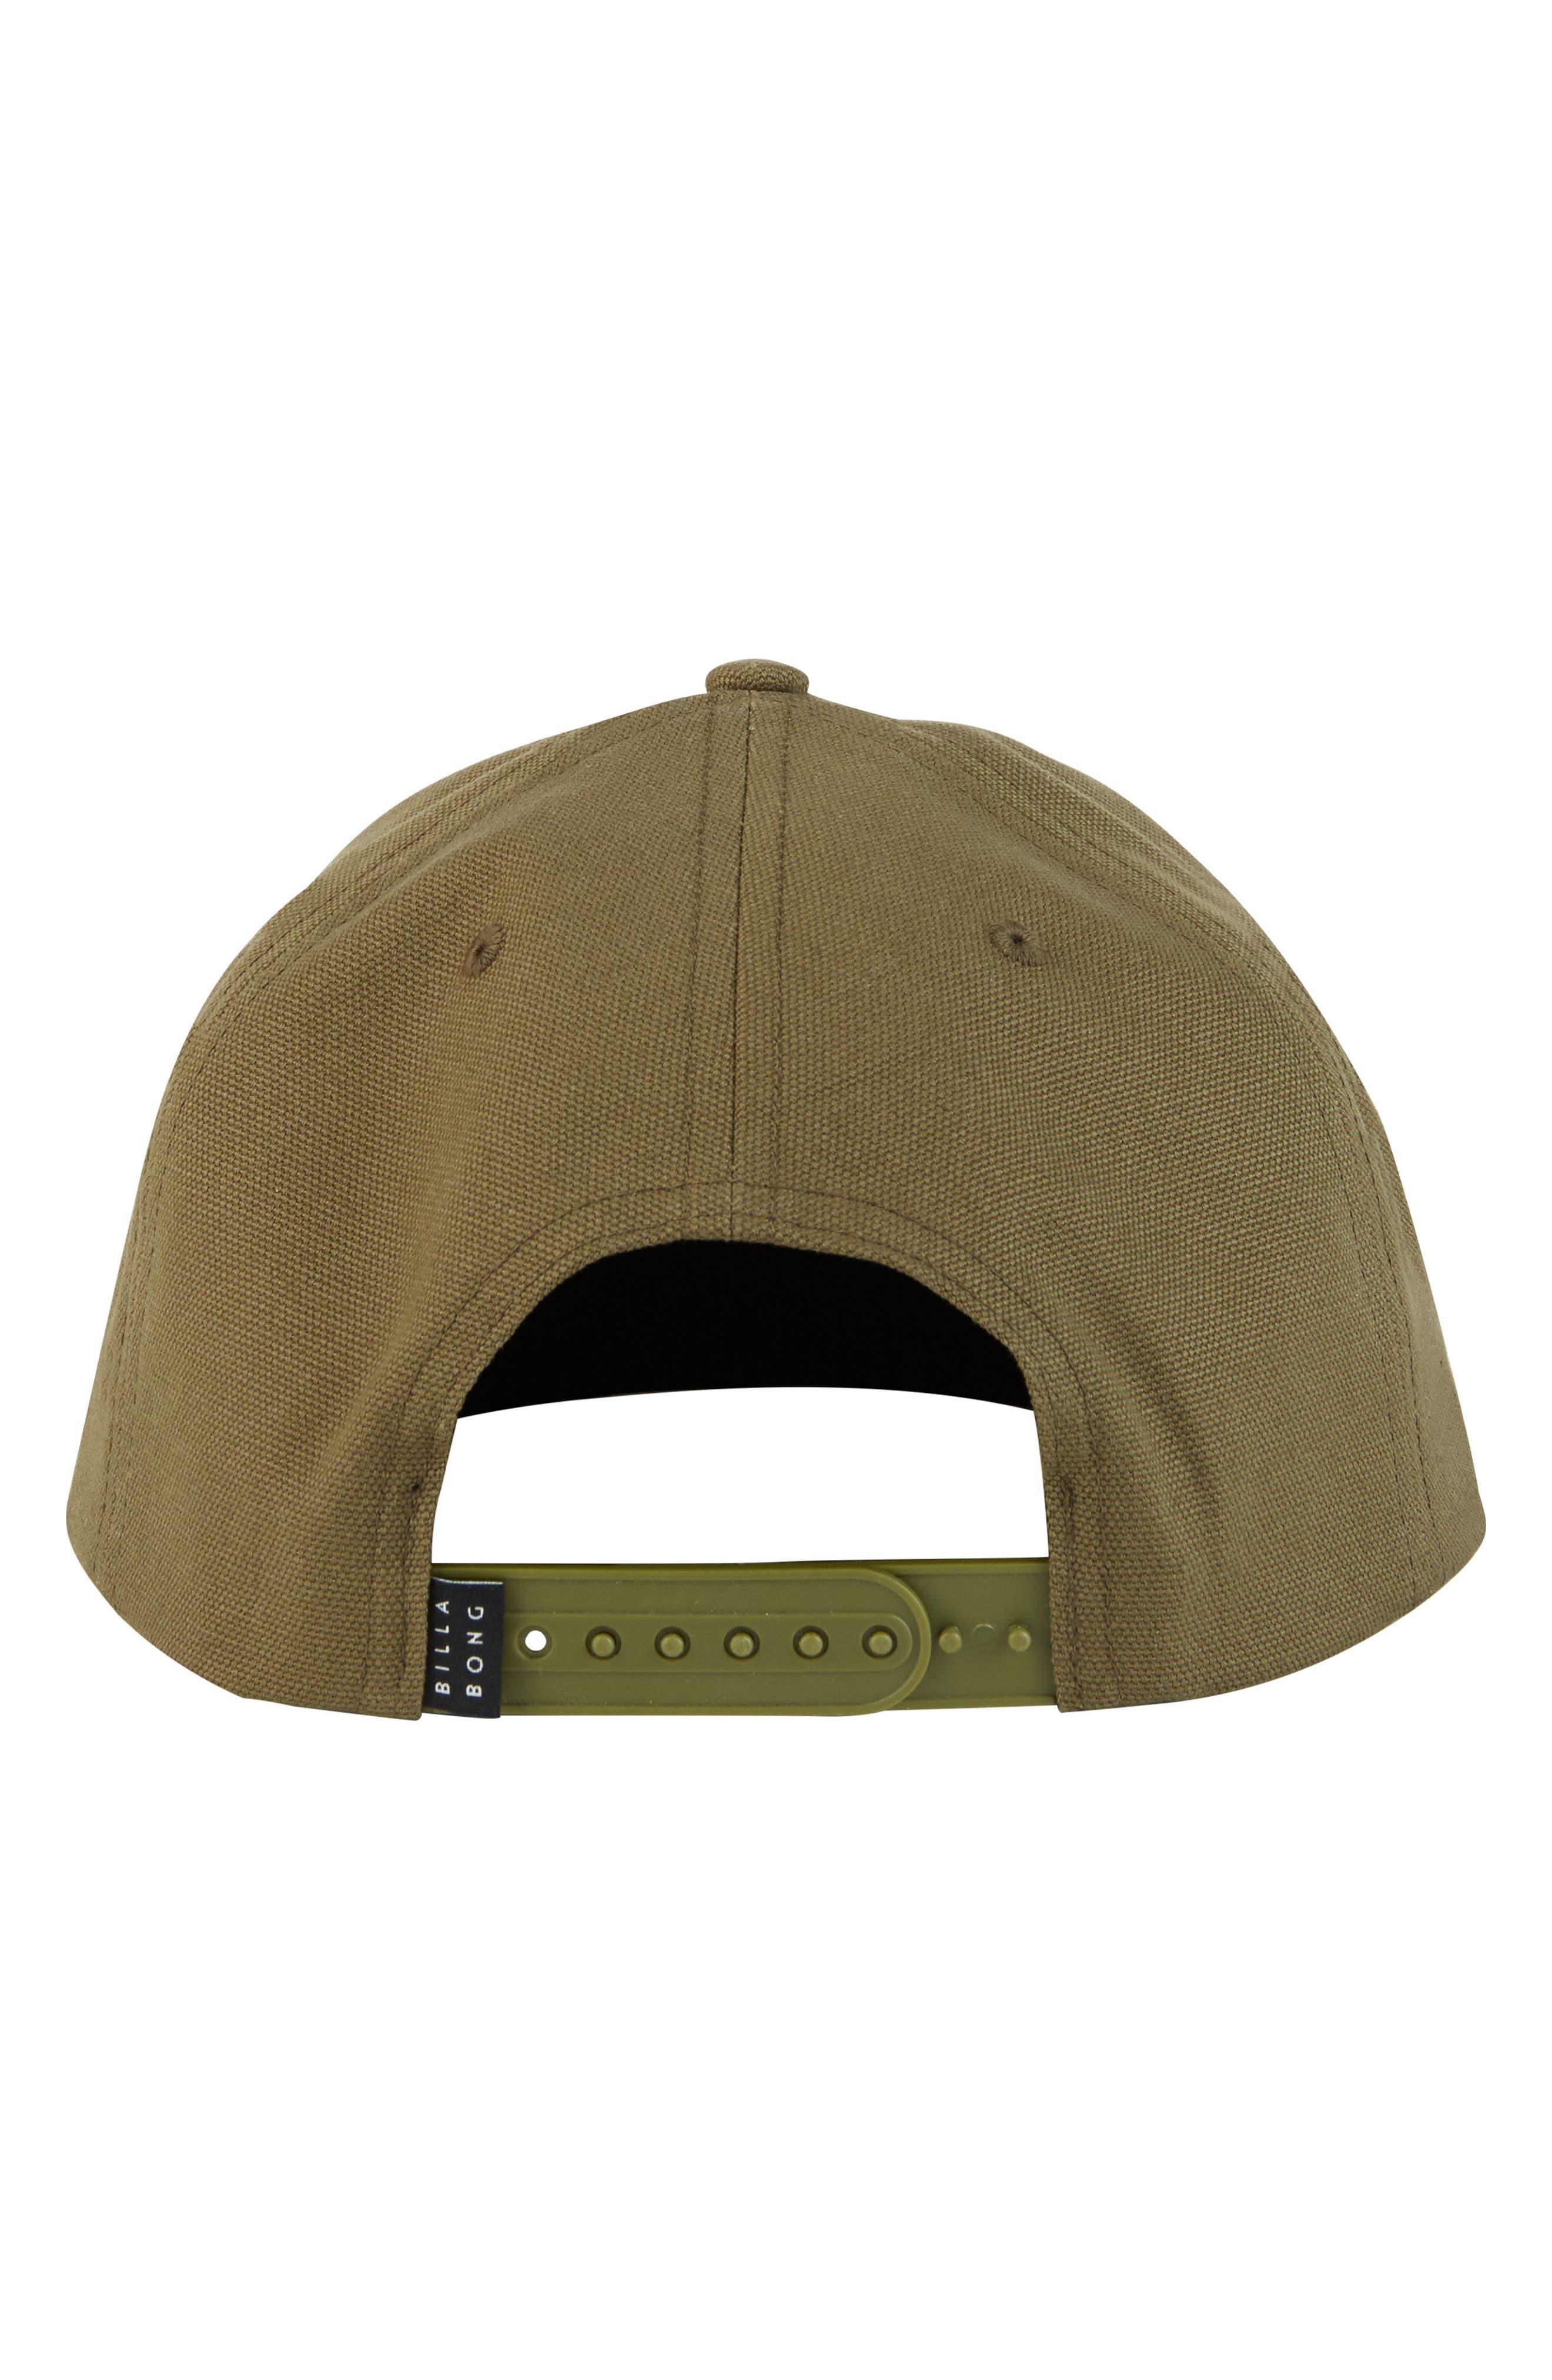 Stacked Snapback Baseball Cap,                             Alternate thumbnail 2, color,                             Olive